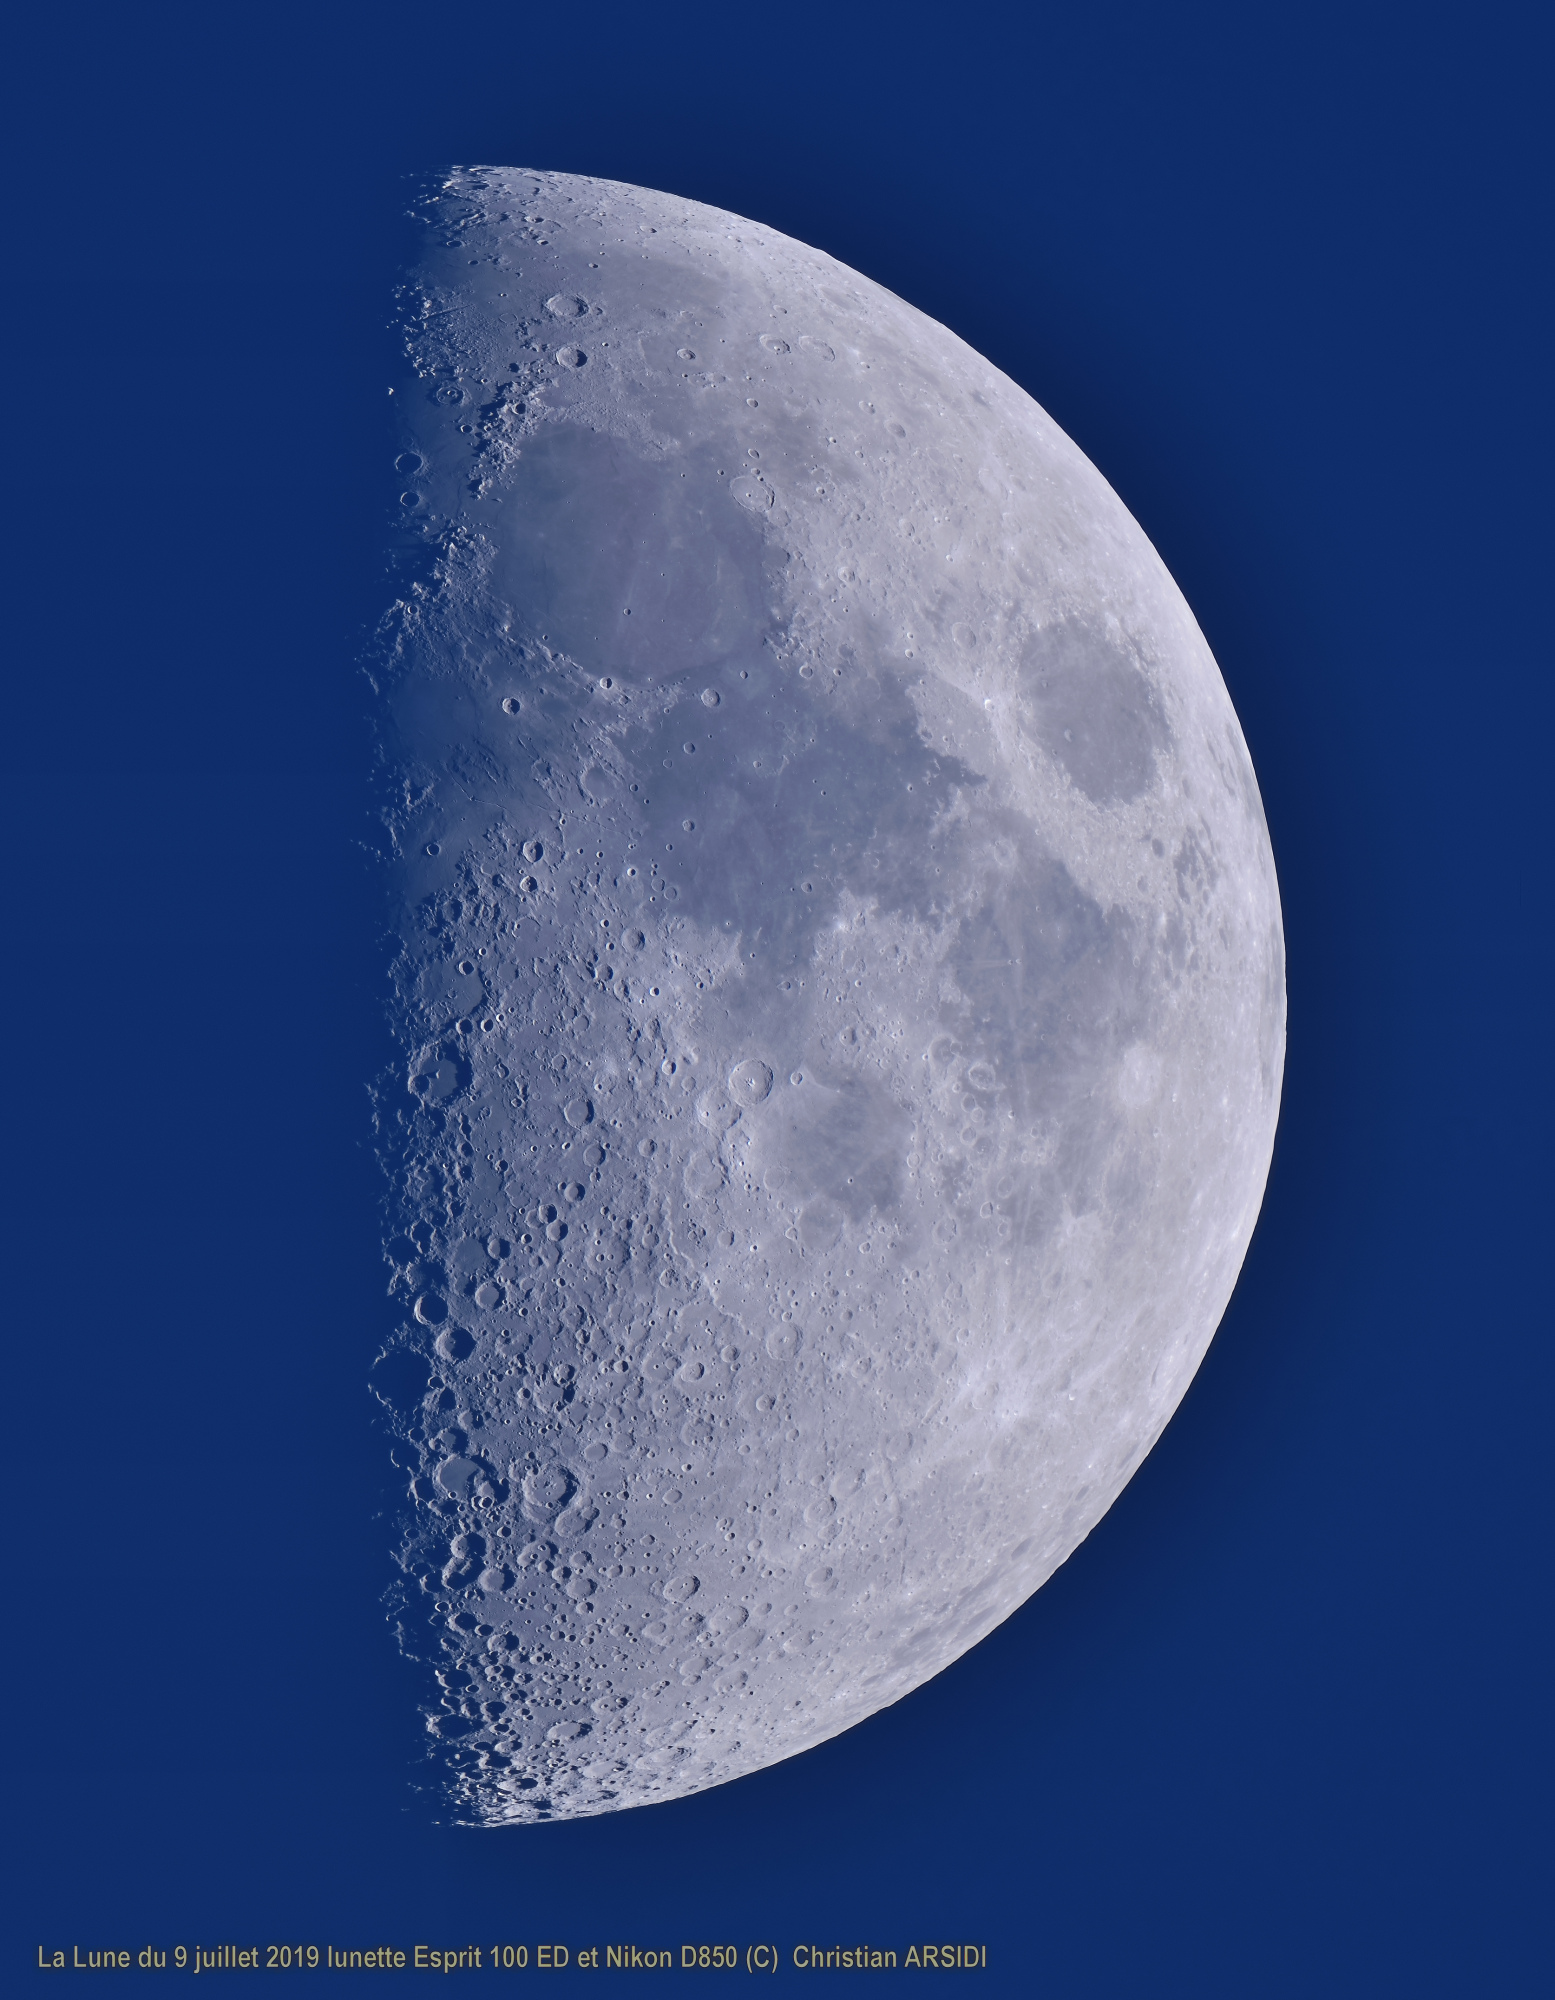 La_Lune_55__images_BV_2_JPEG.jpg